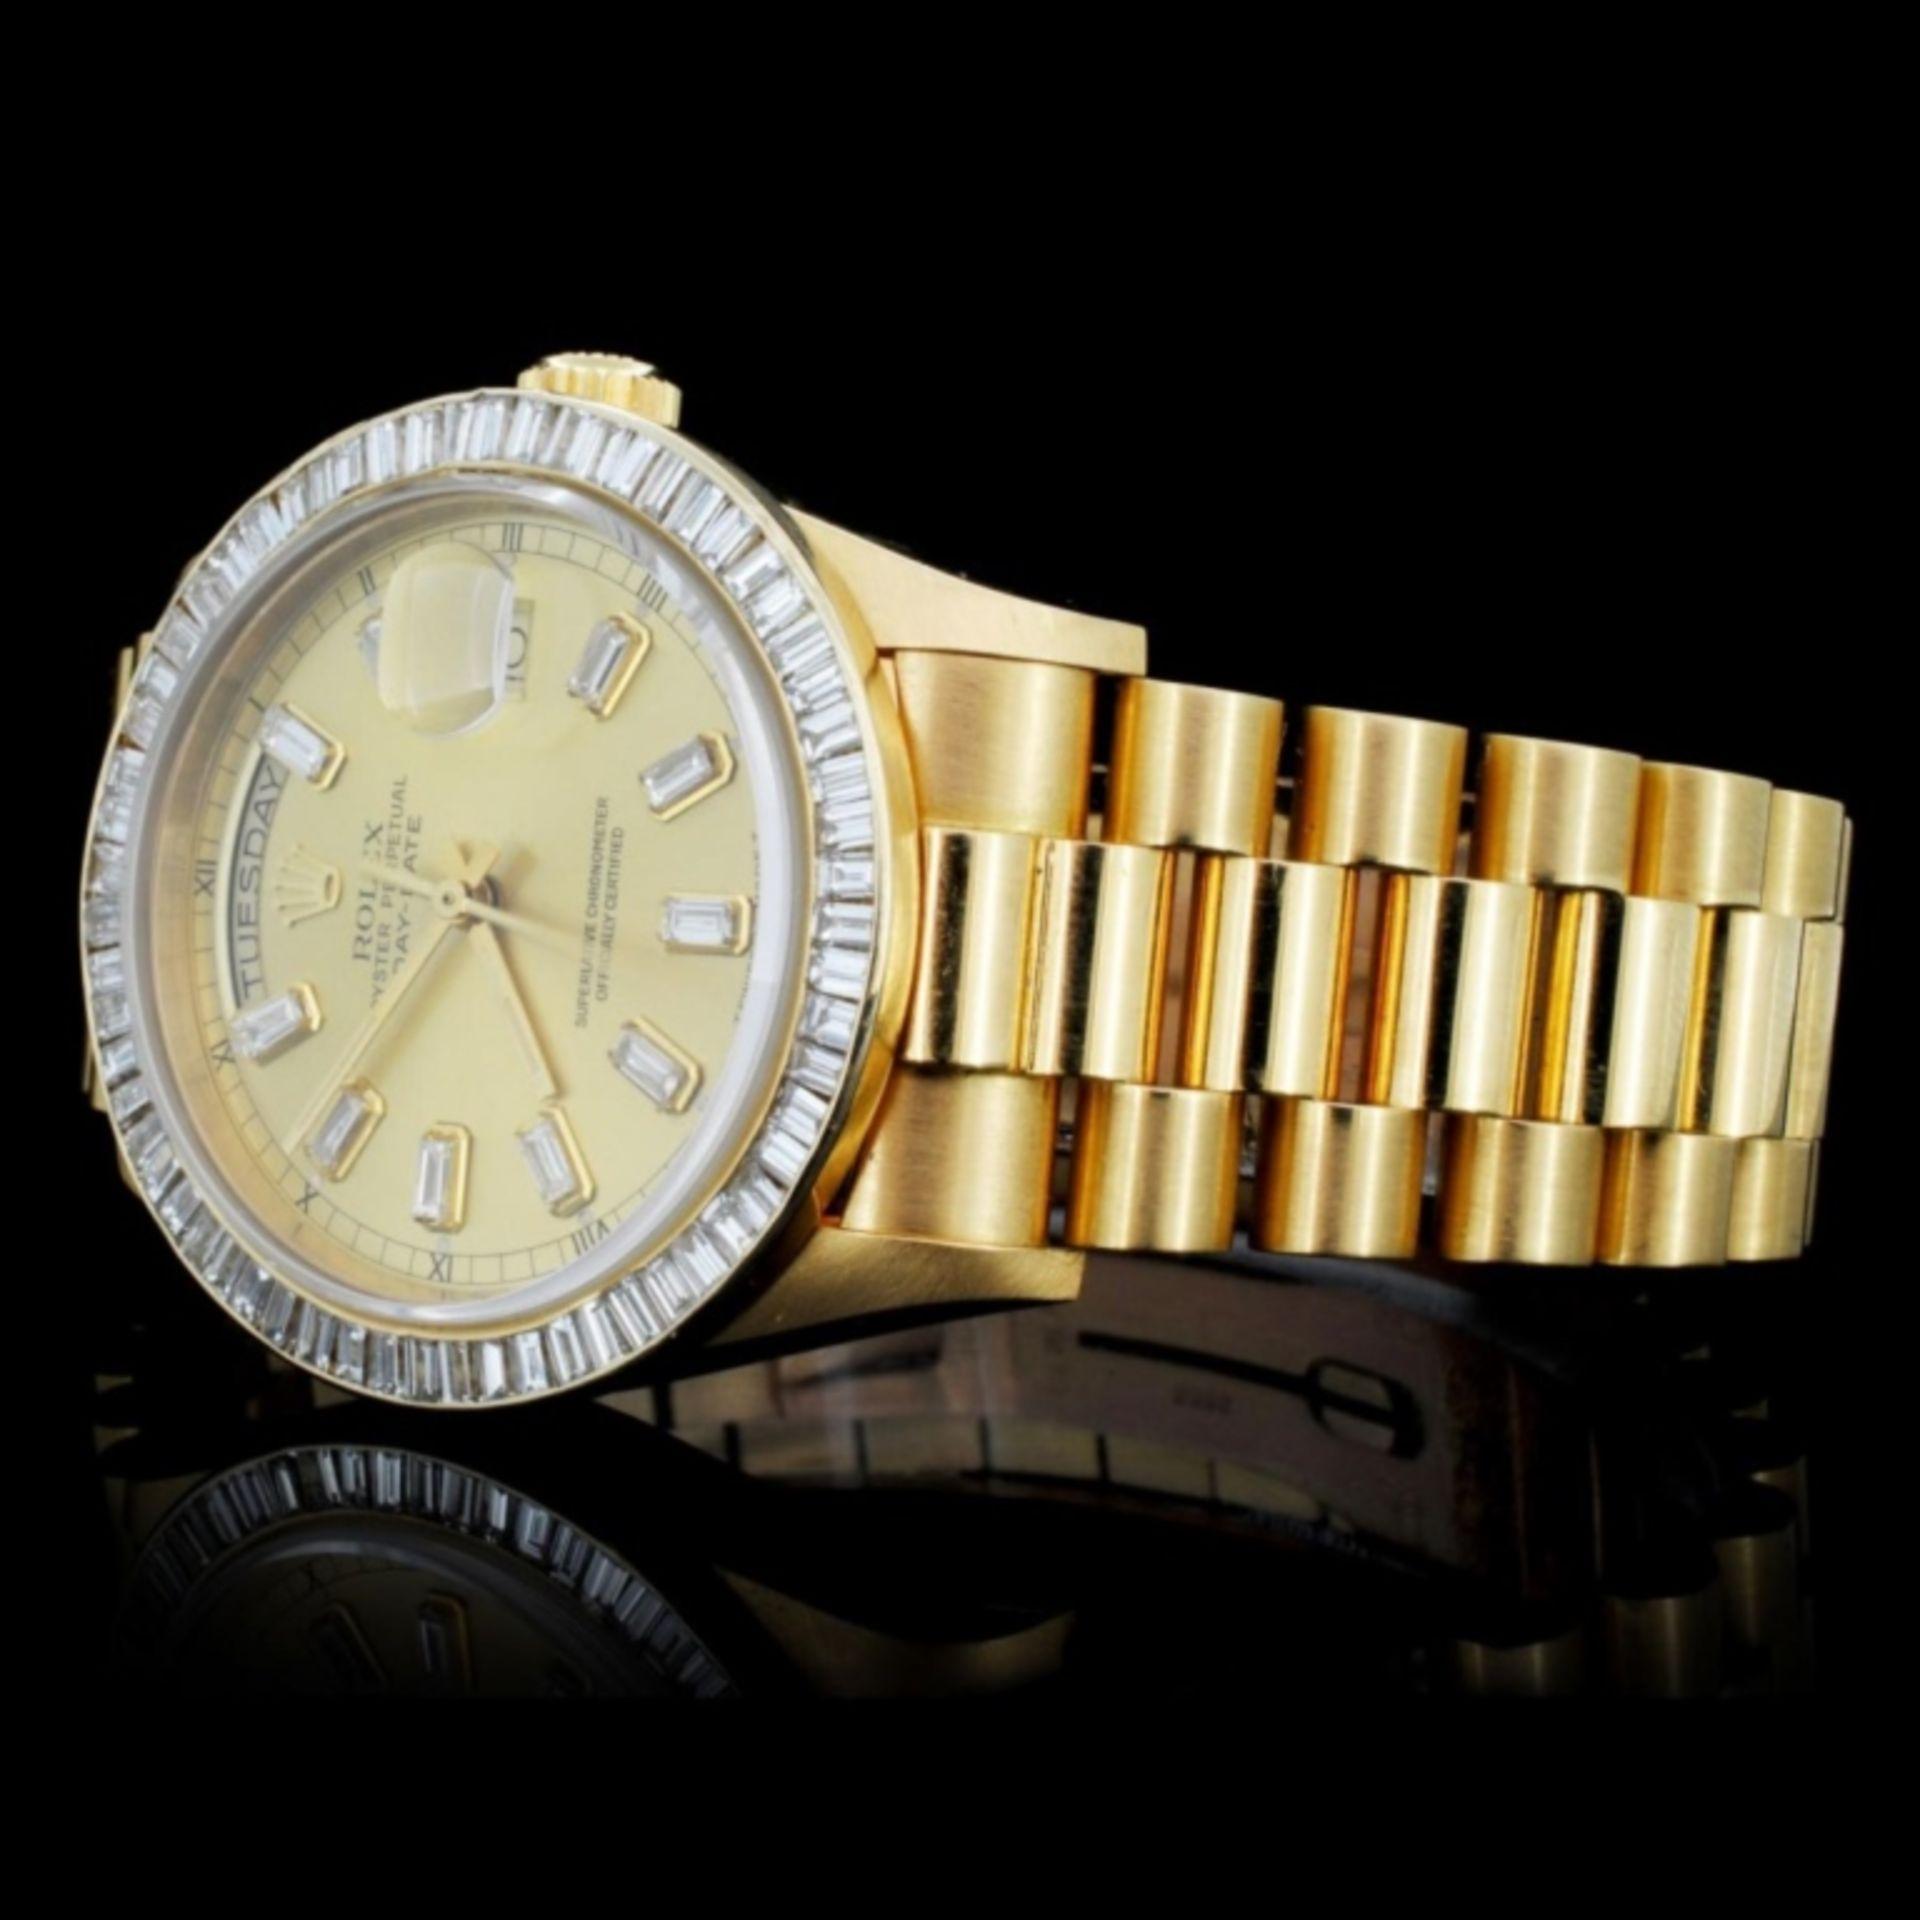 Rolex Day-Date Diamond 36mm Wristwatch - Image 3 of 6